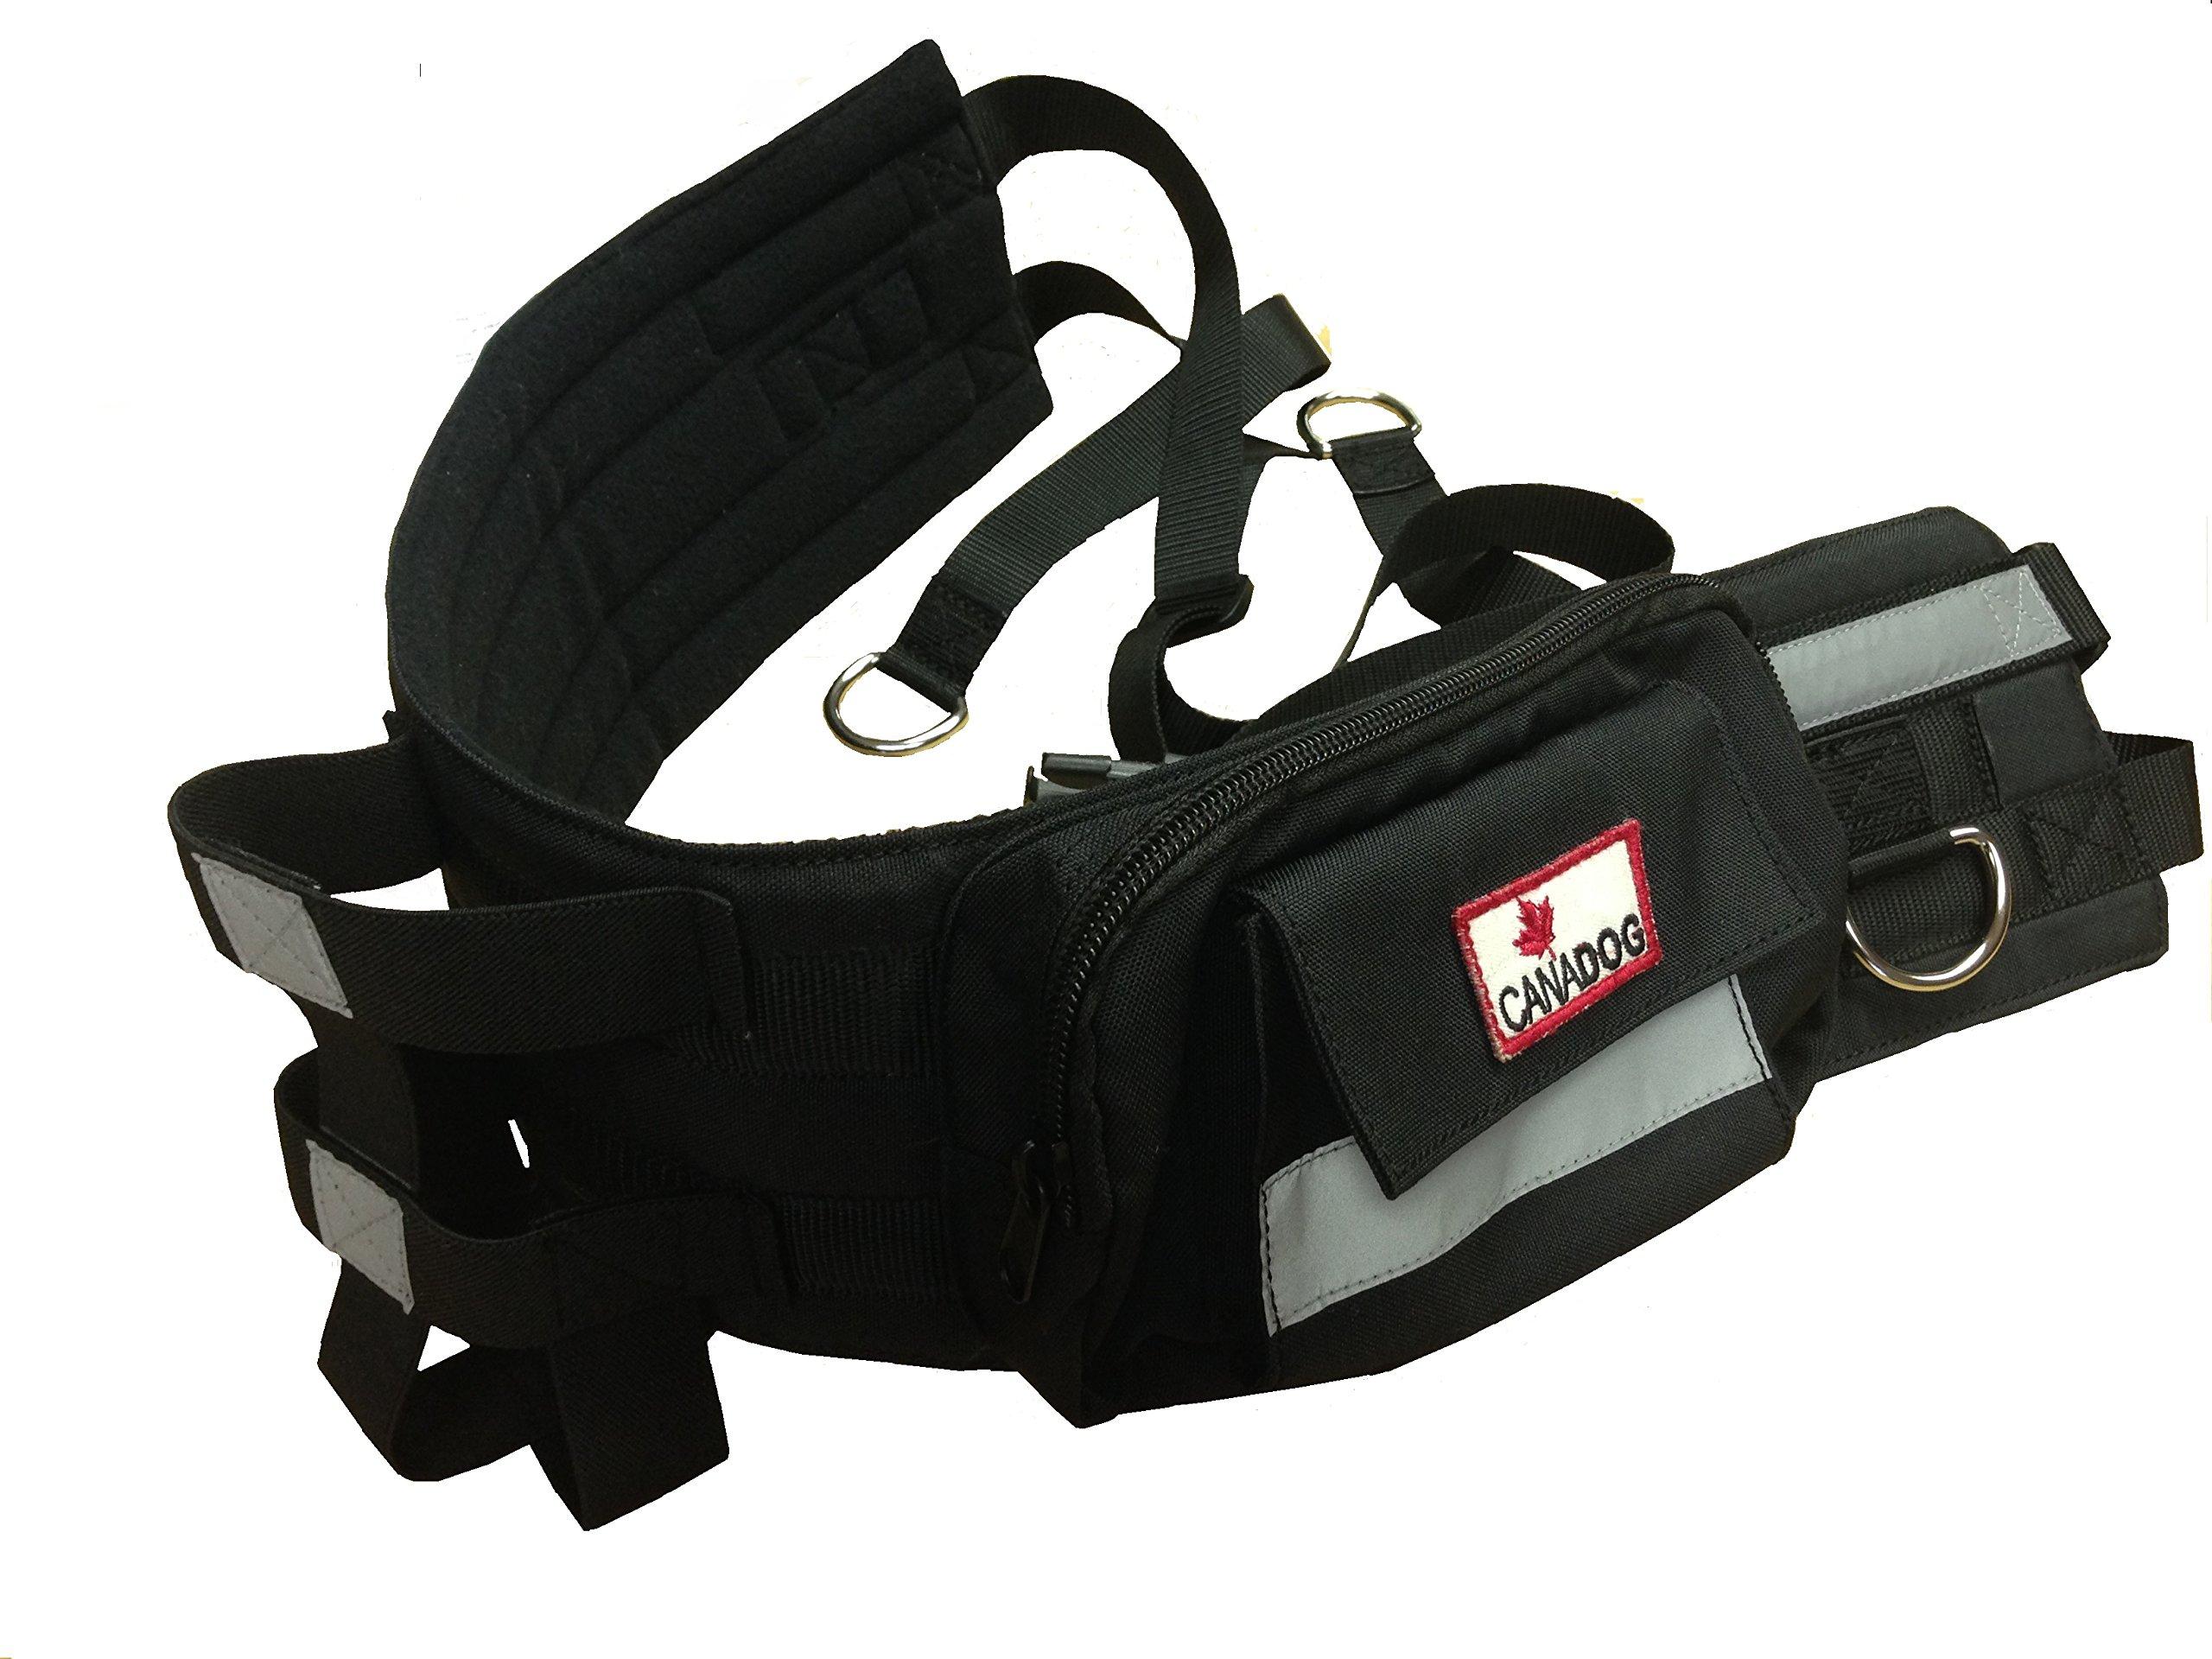 CanaDog Canicross/Hands-Free Walking Belt